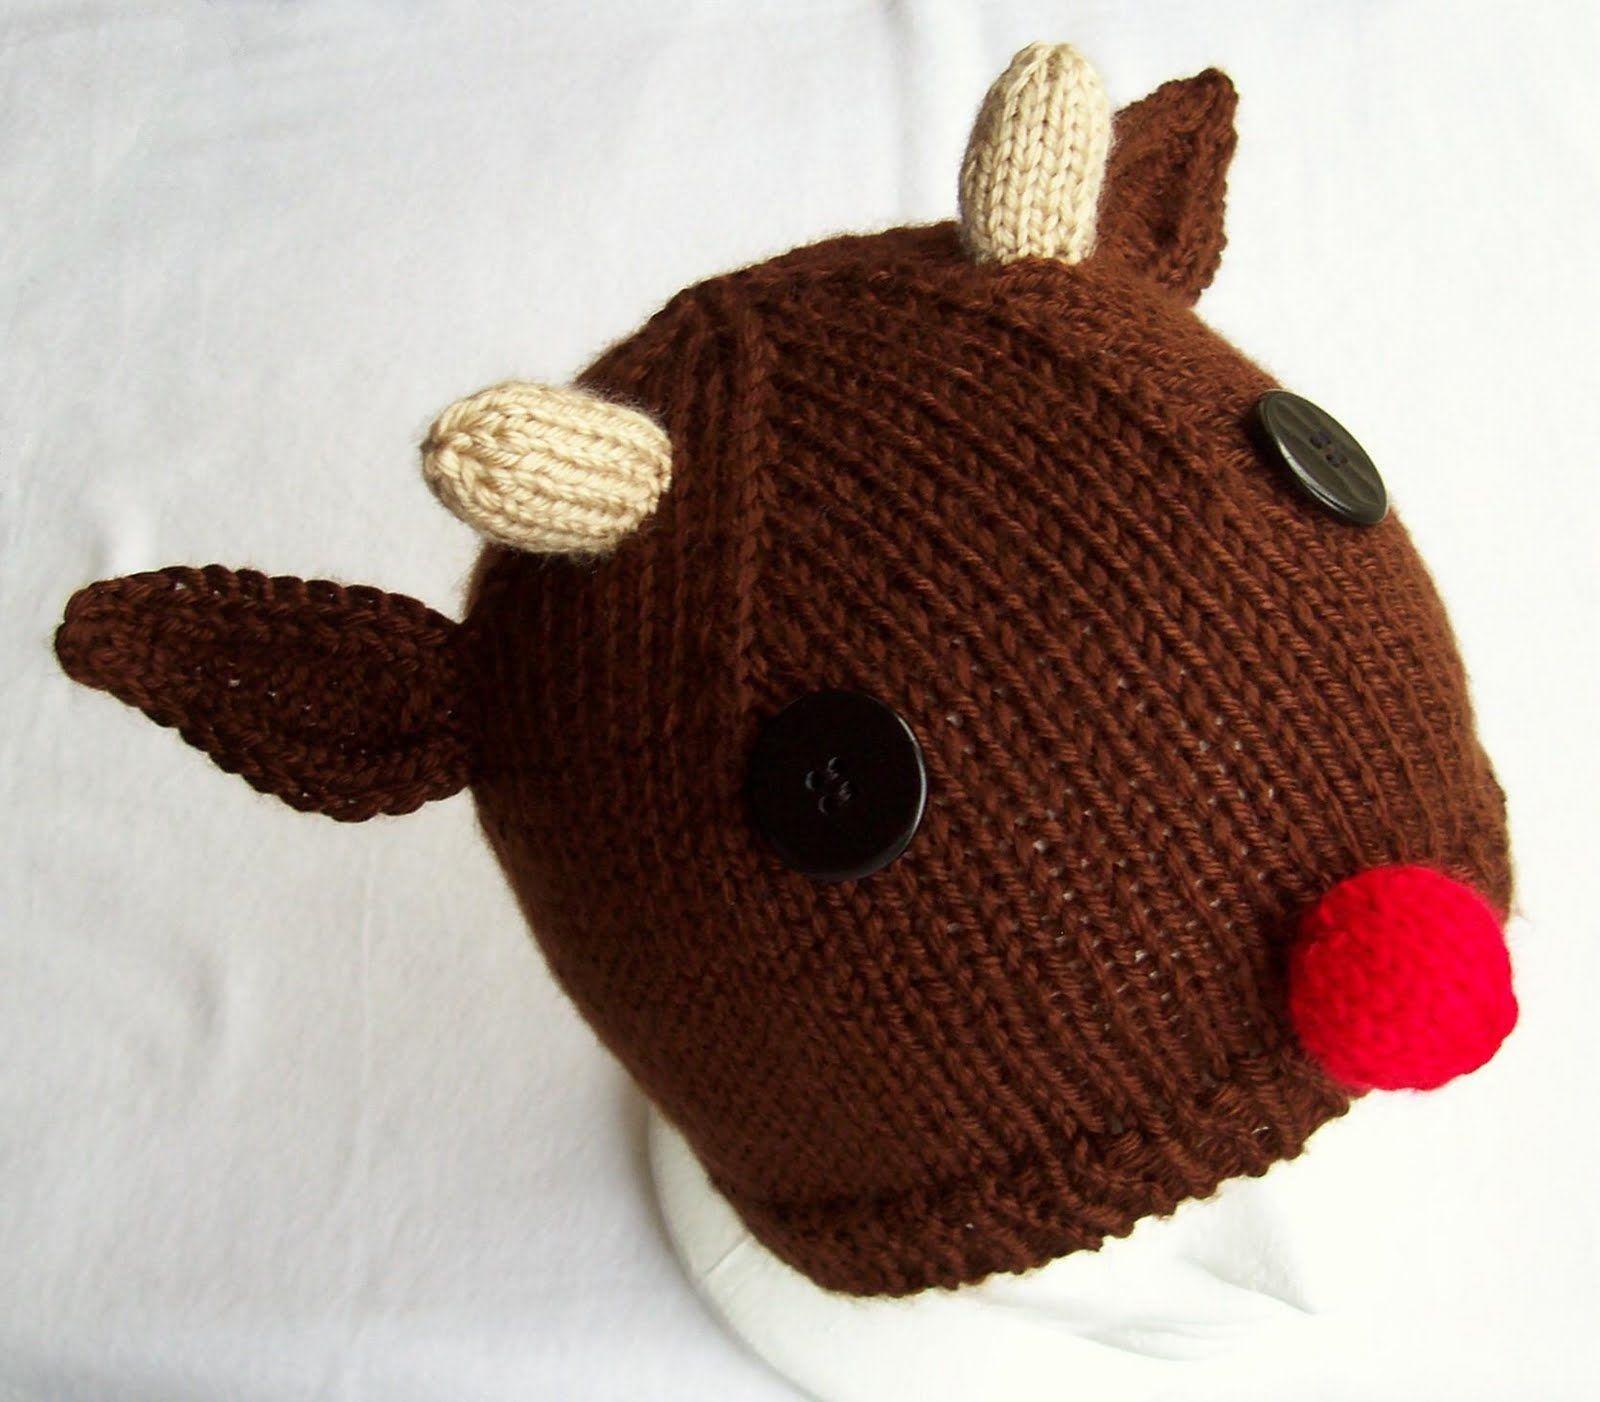 Carissa Knits: Rudolph Hat...FREE PATTERN | Knitting | Pinterest ...